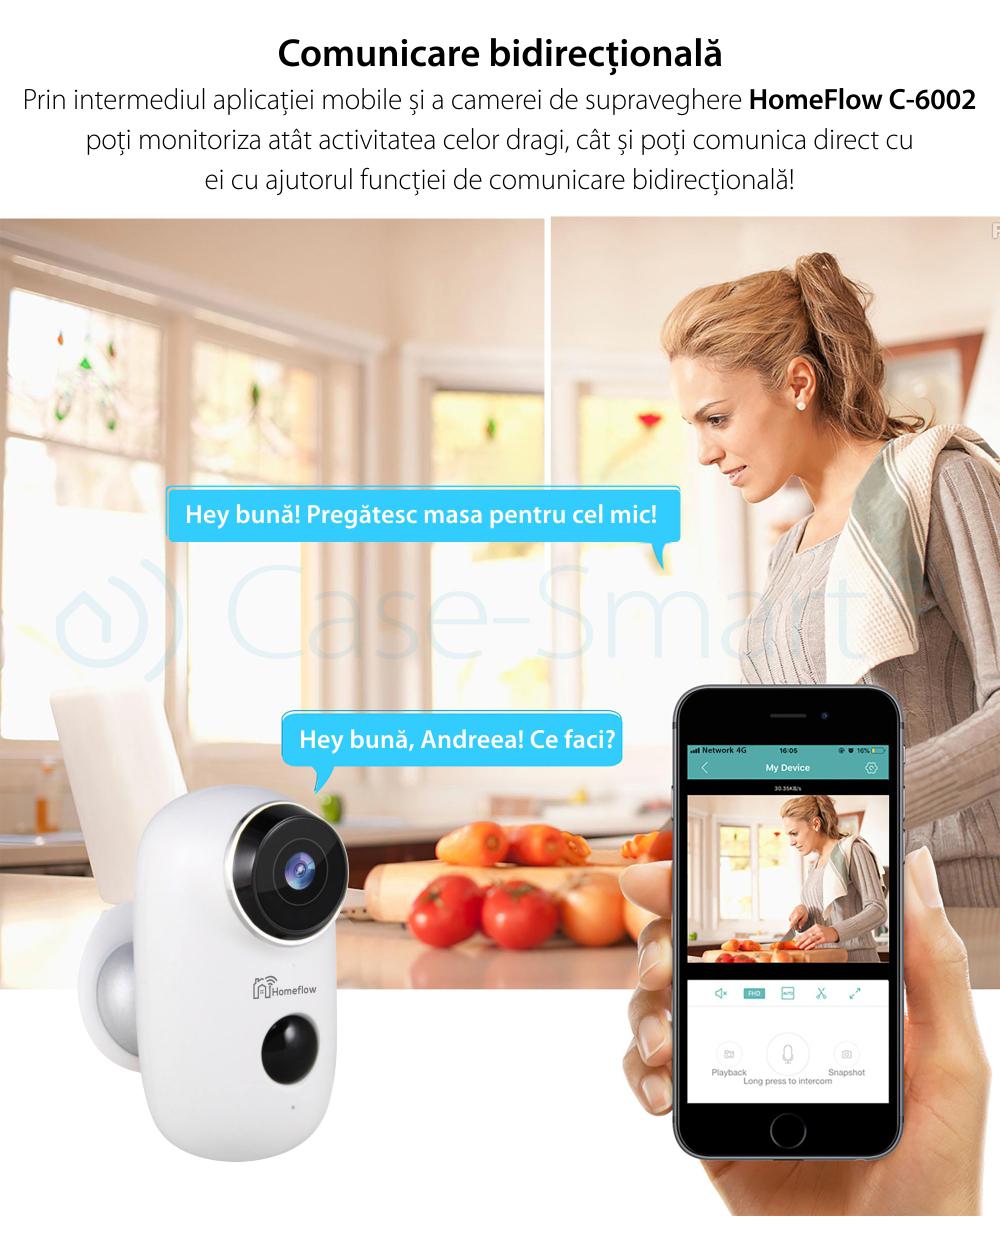 Camera de supraveghere inteligenta Wireless Homeflow C-6002, Comunicare bidirectionala, Detectie miscare